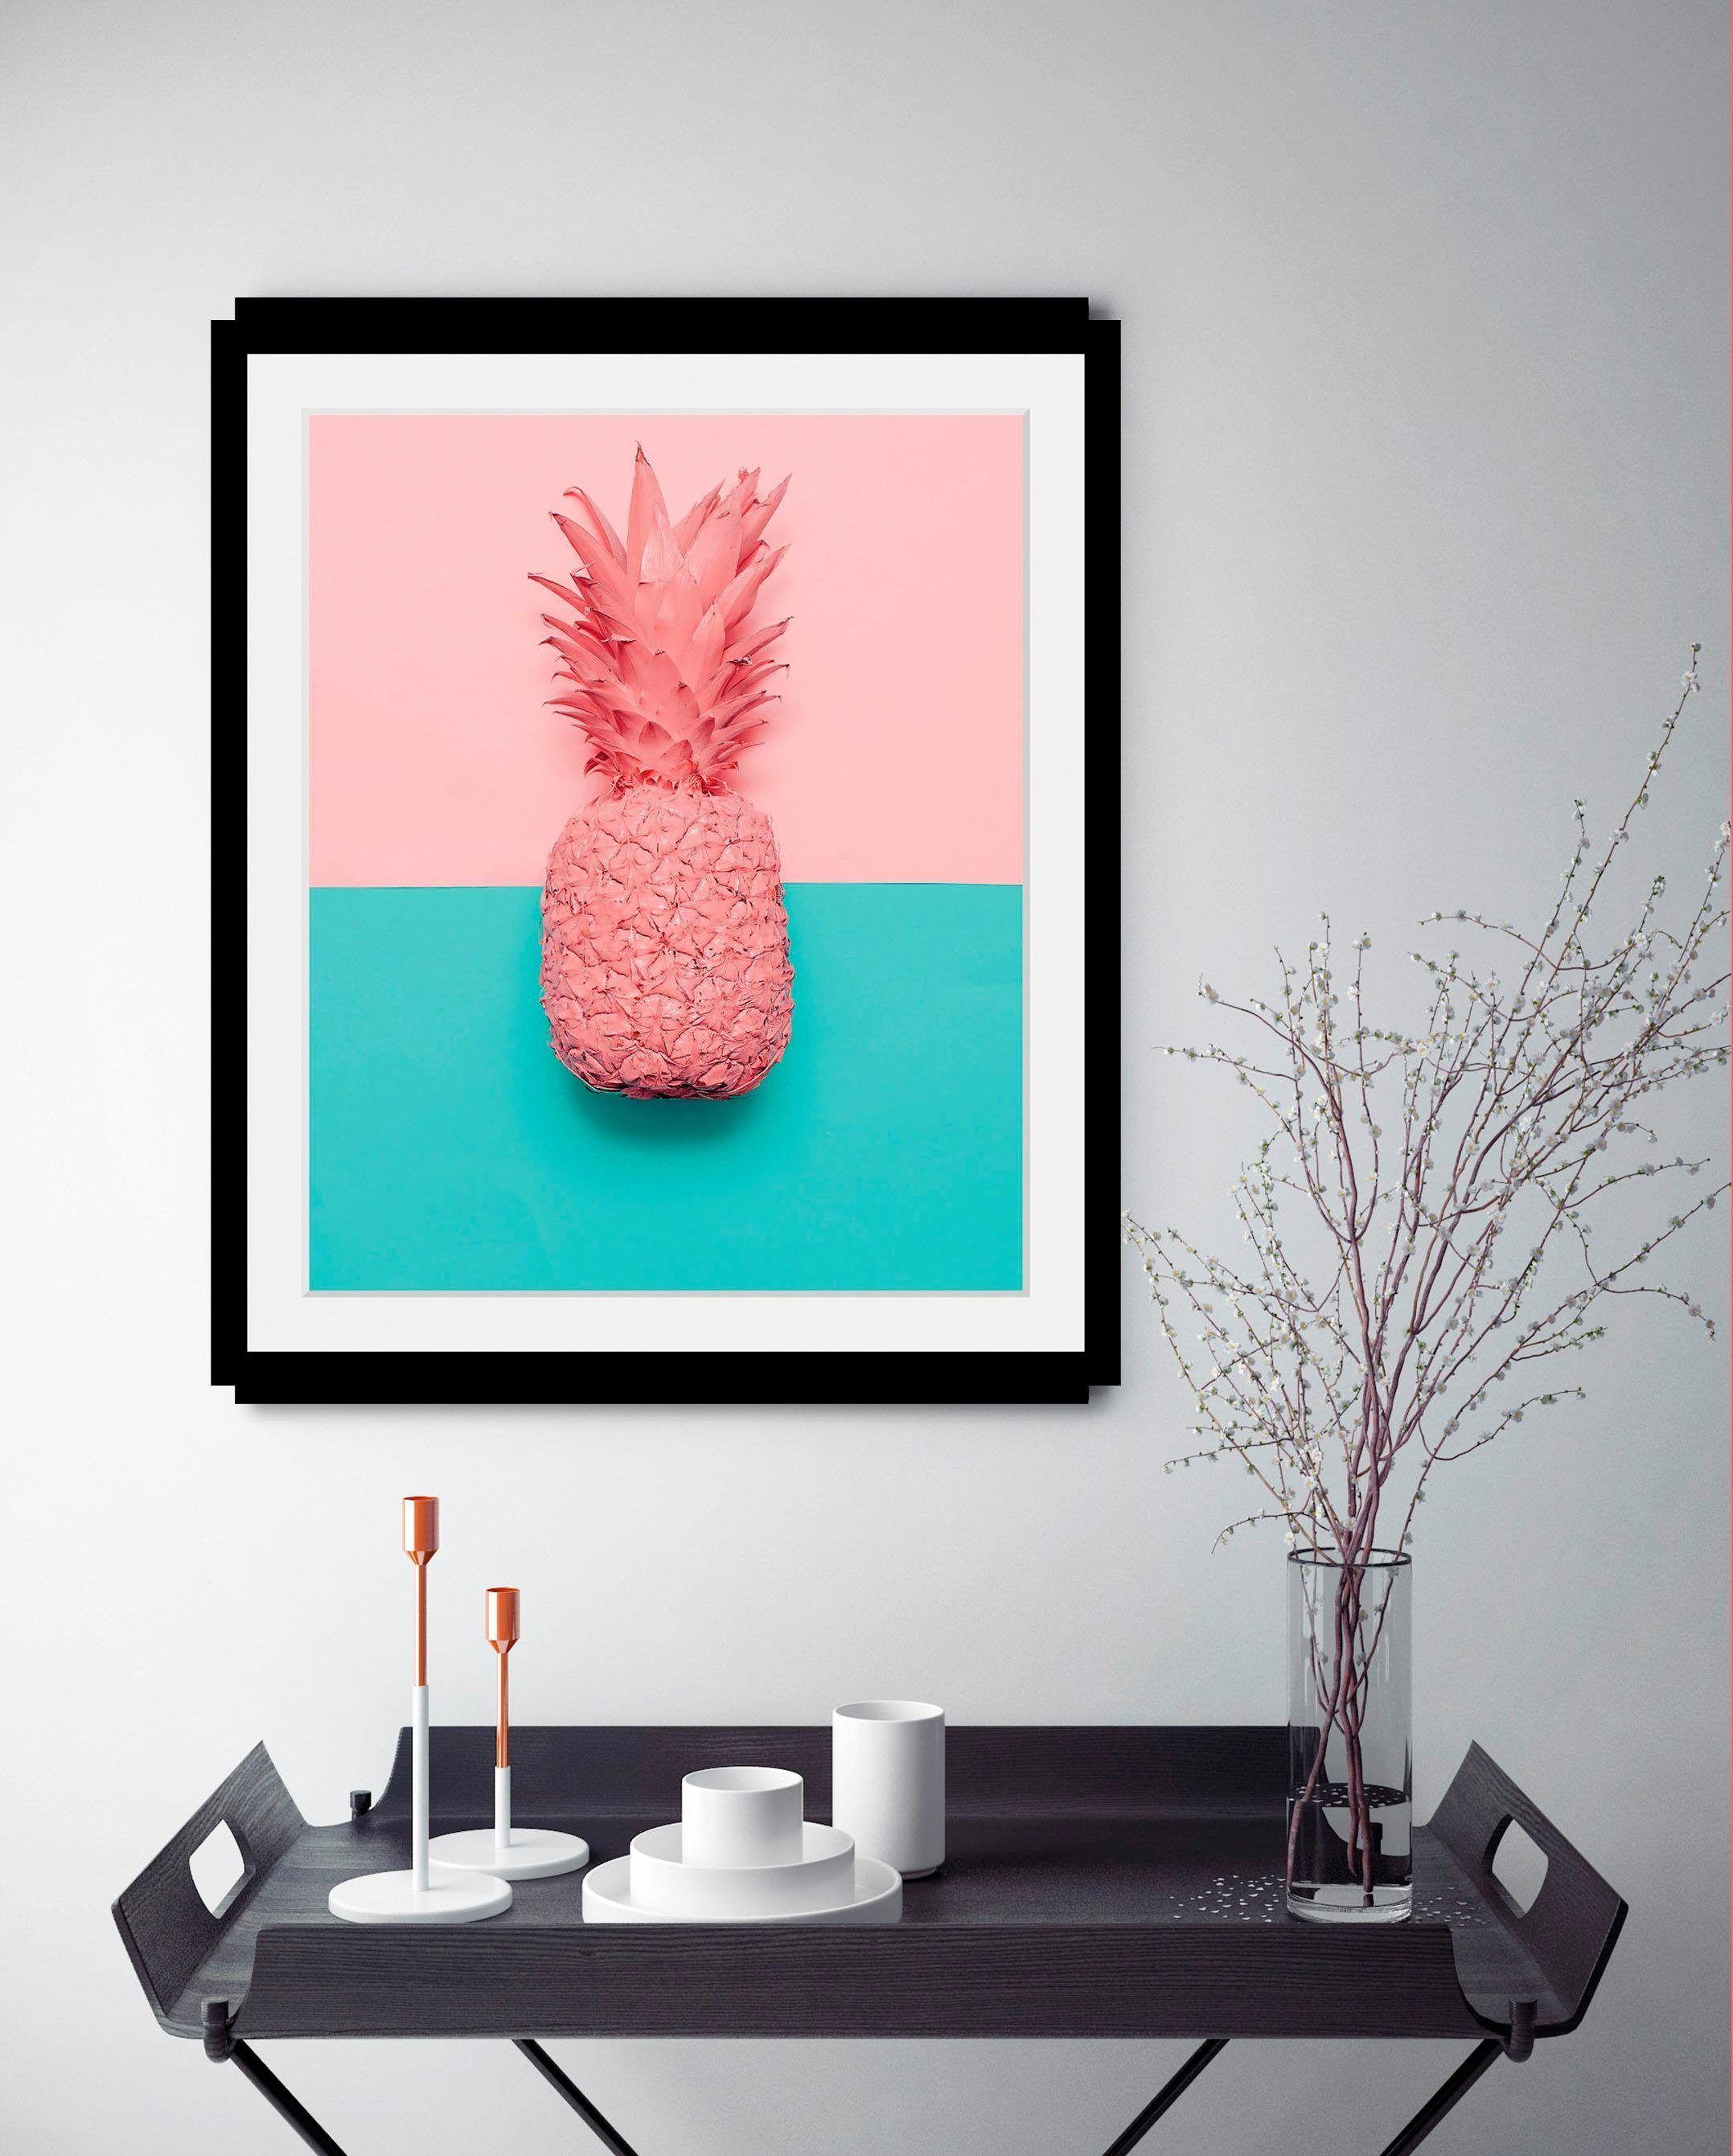 Bild »Ananas«, mehrfarbig, Material Acrylglas, Yourhome